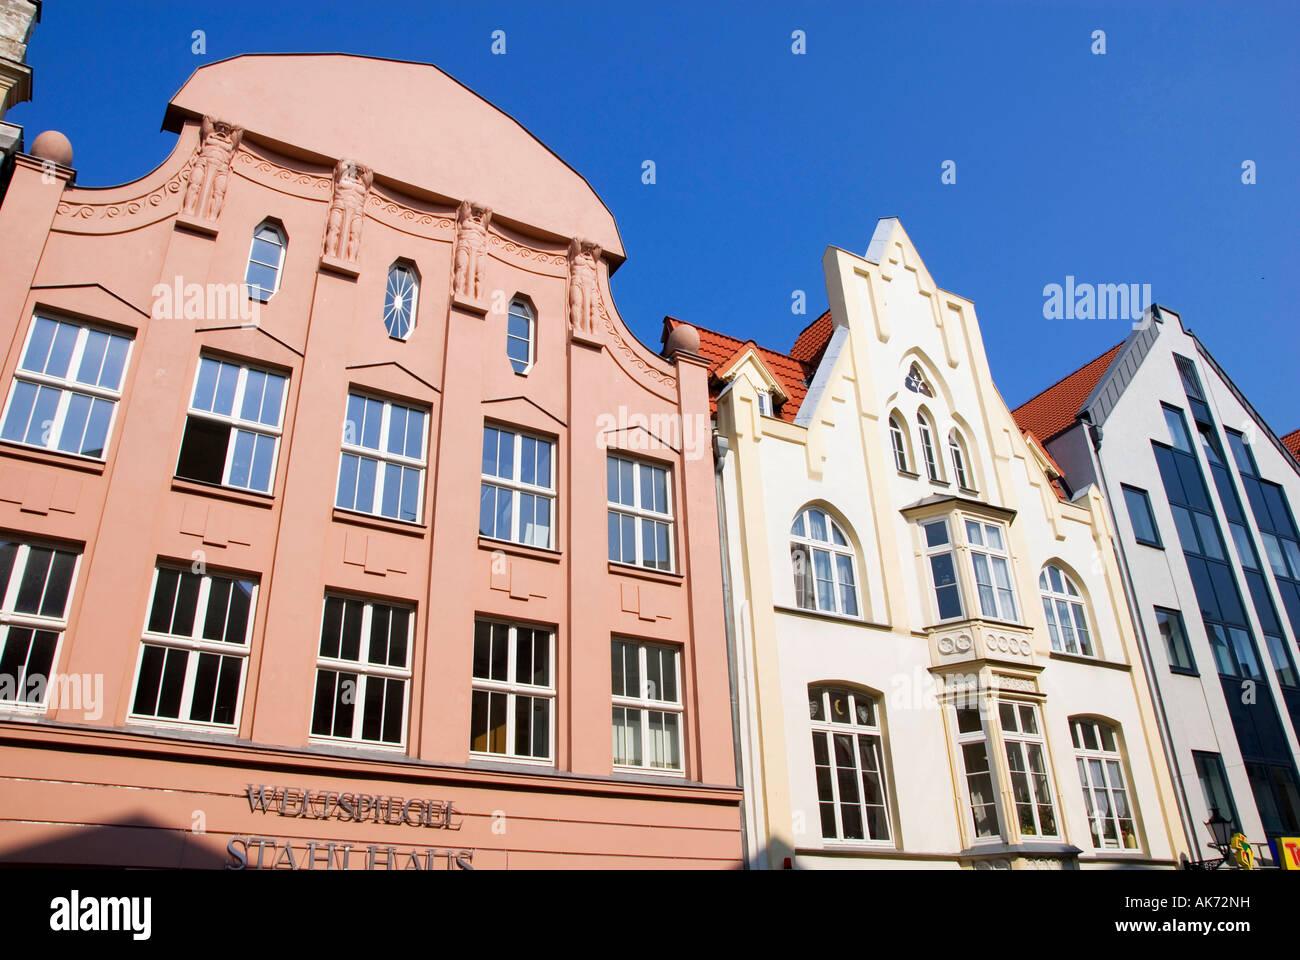 Row of houses / Wismar - Stock Image